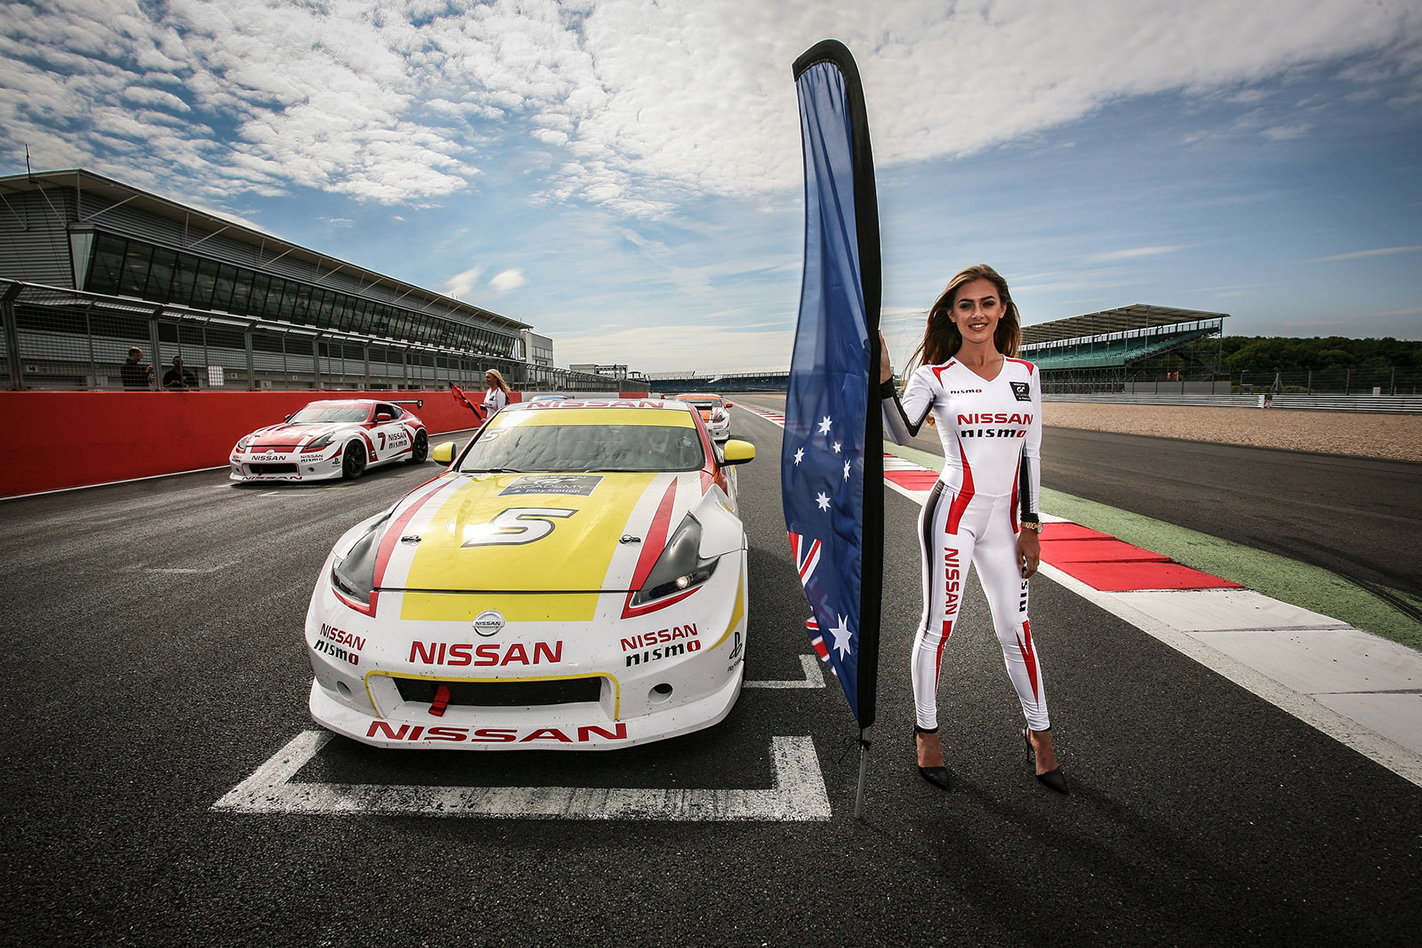 Aussie conquers Nissan GT Academy championship